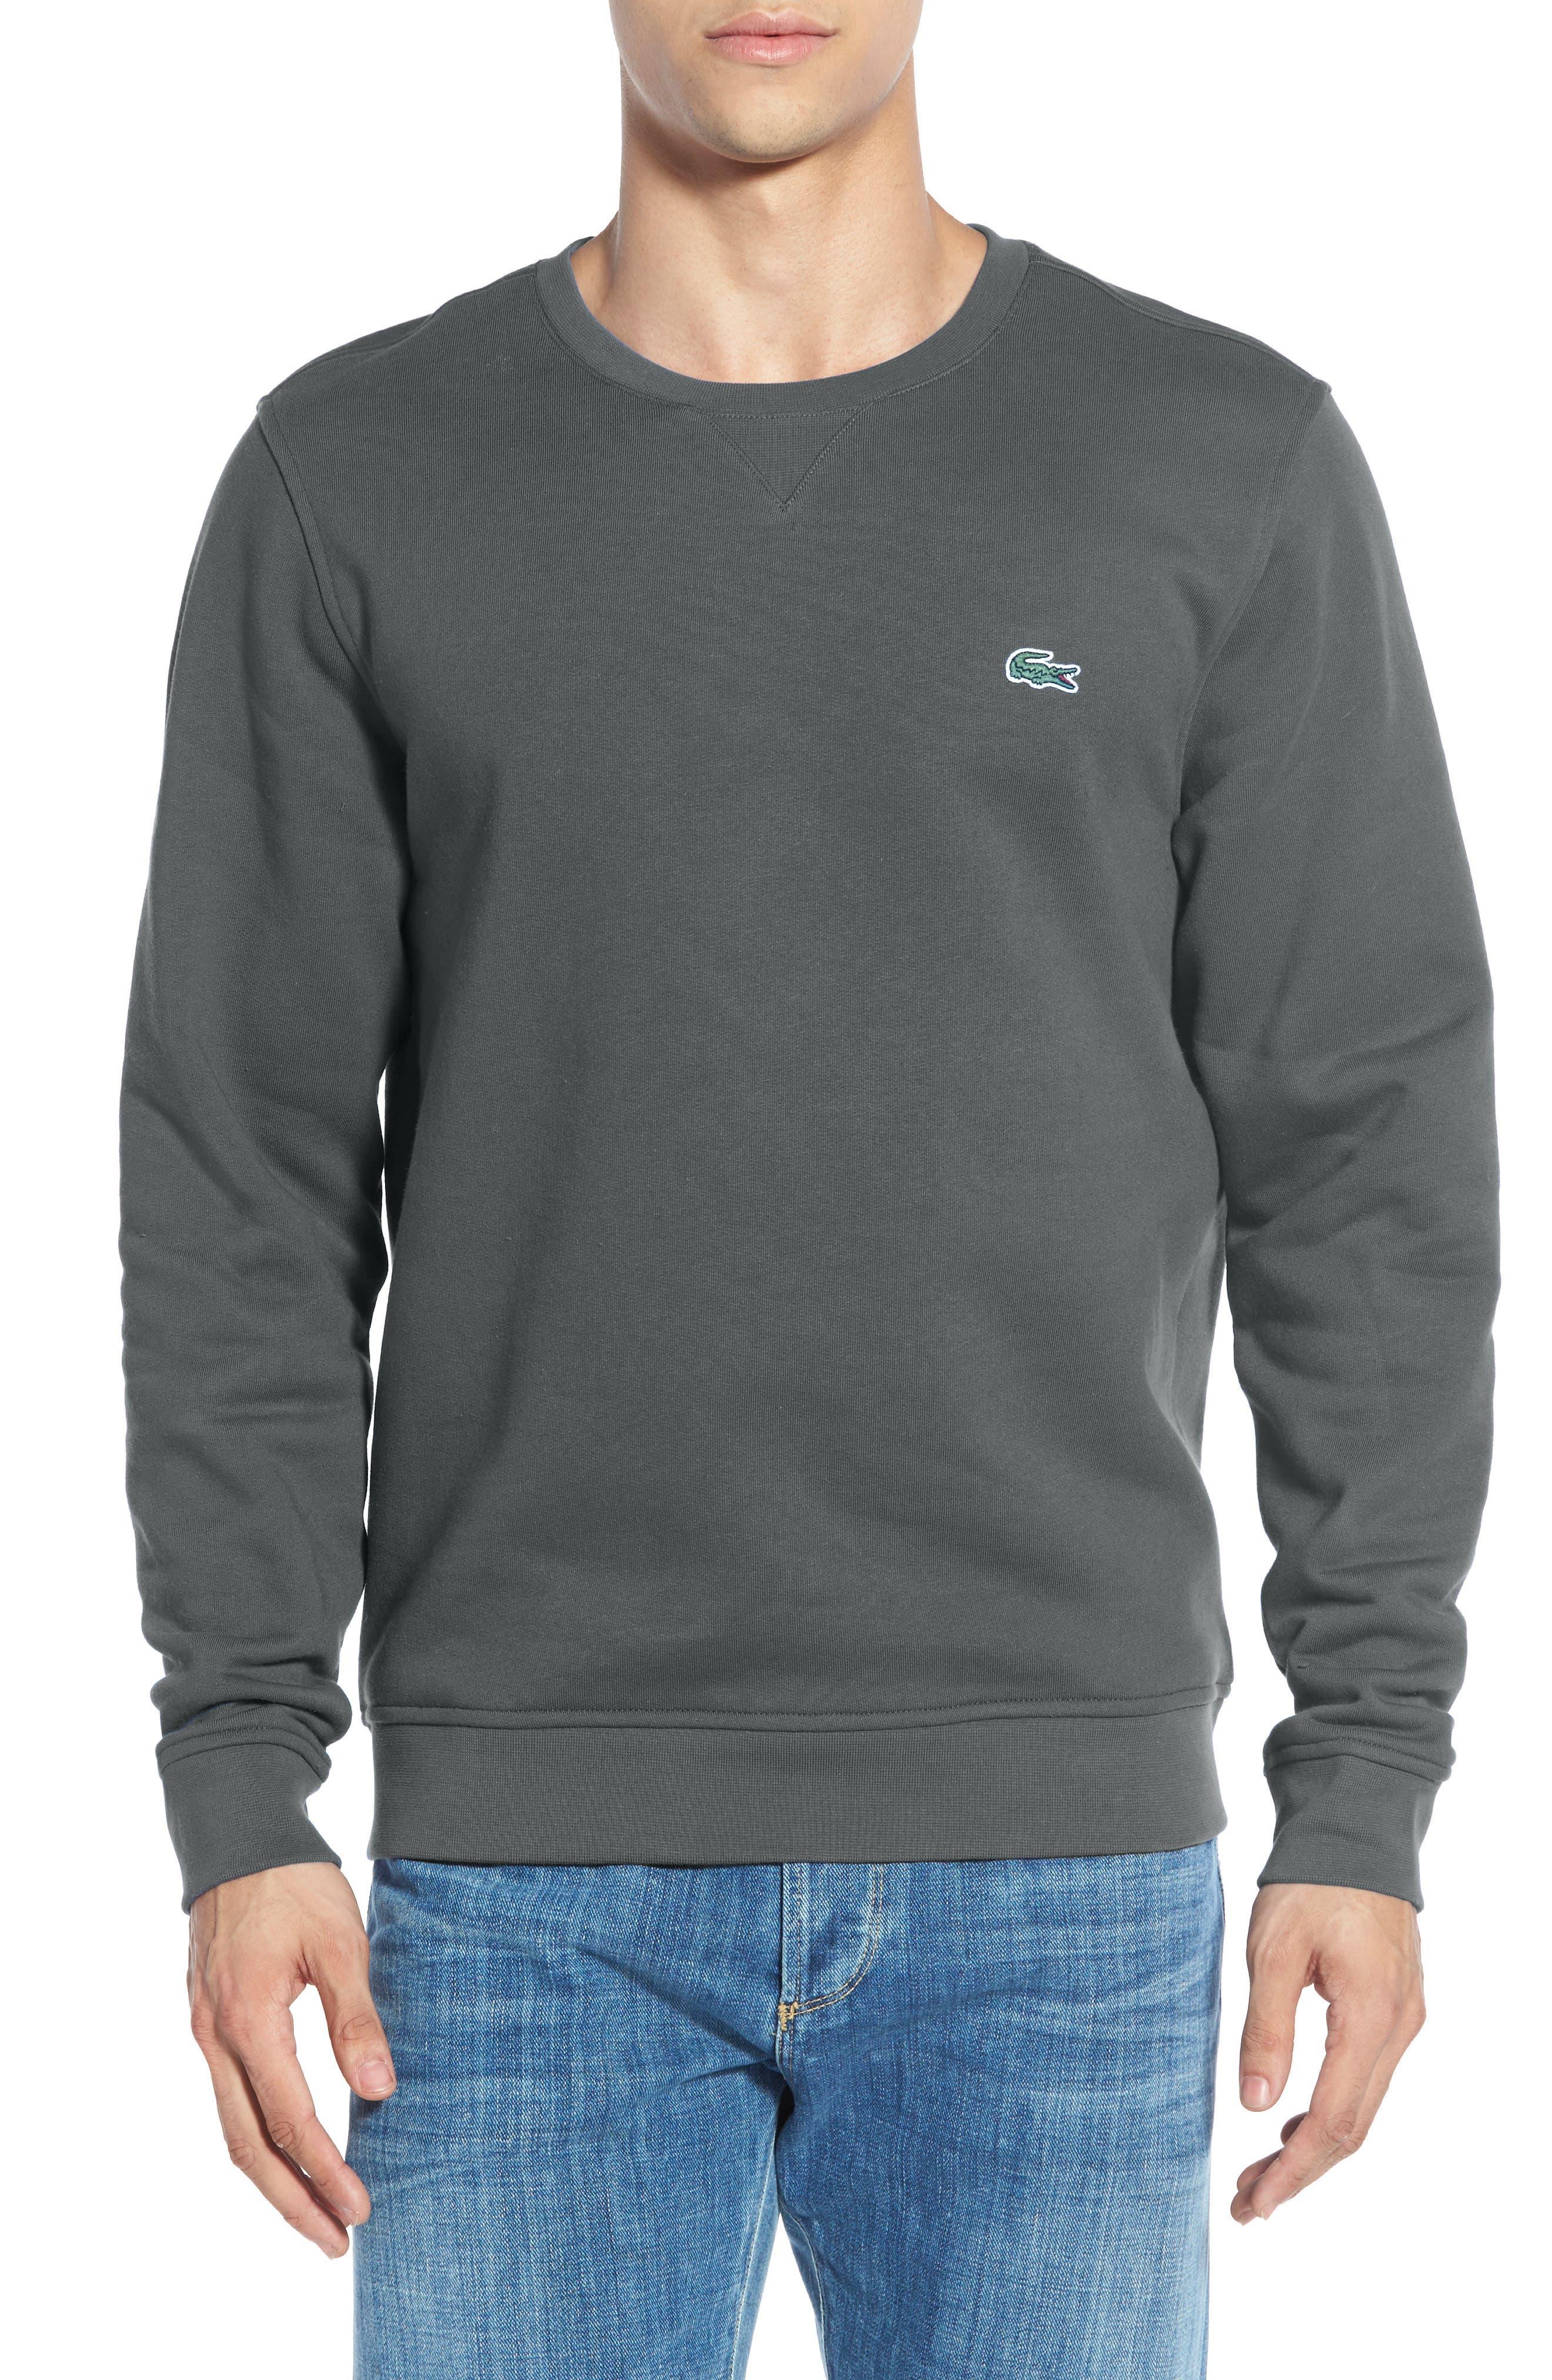 LACOSTE 'Sport' Crewneck Sweatshirt